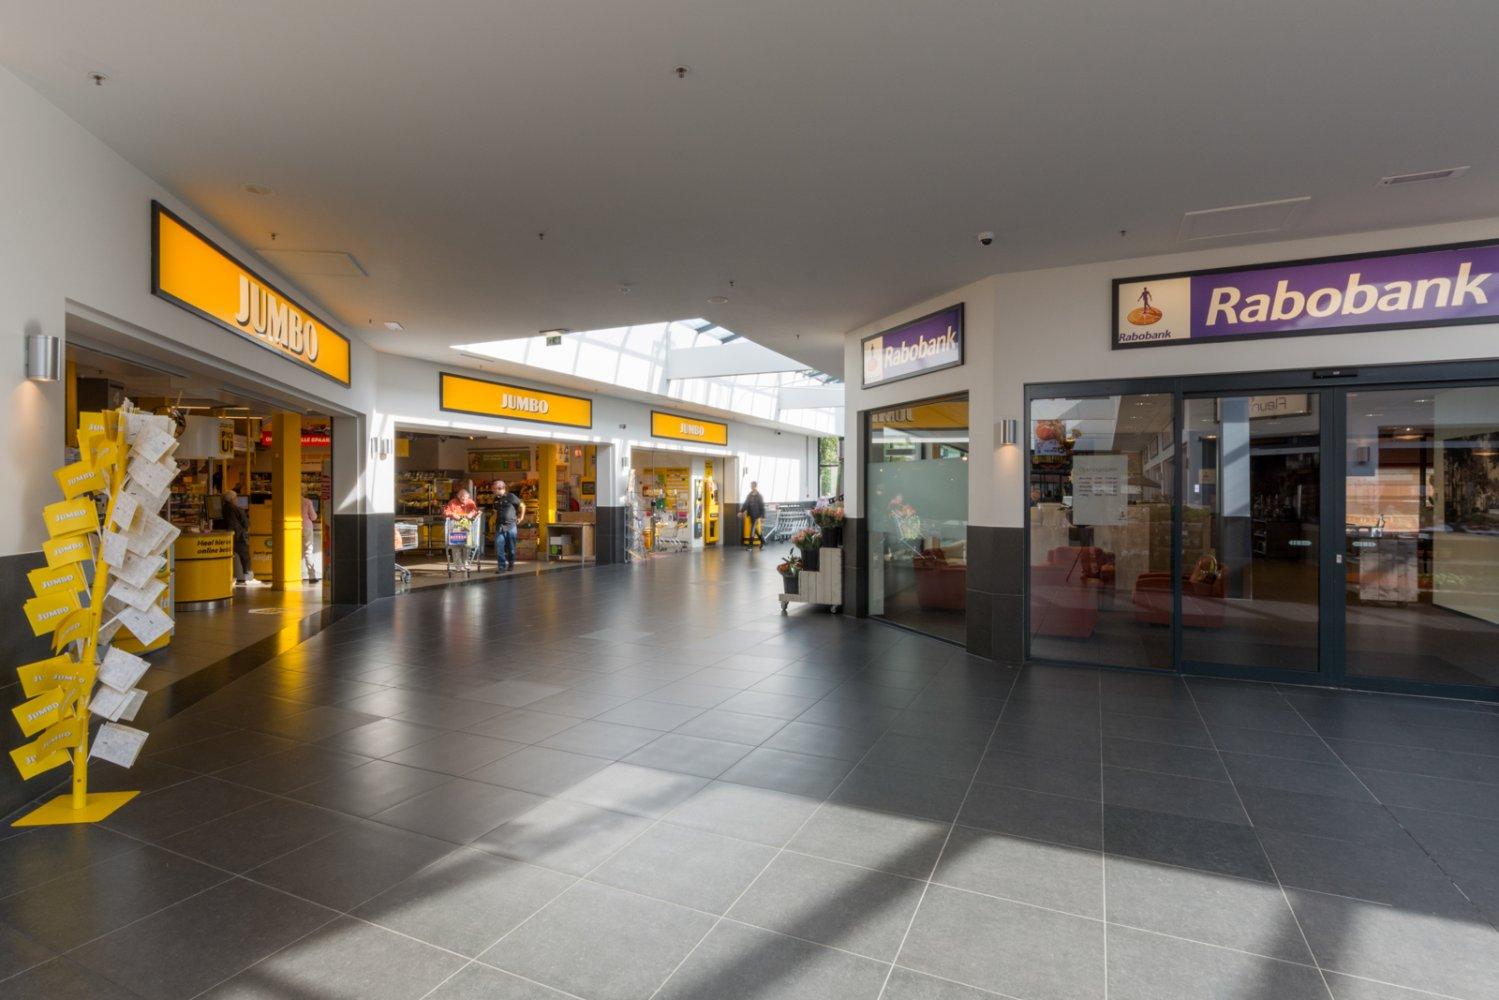 Winkelcentrum de burcht stappen shoppen breda for Bioscoopagenda rotterdam